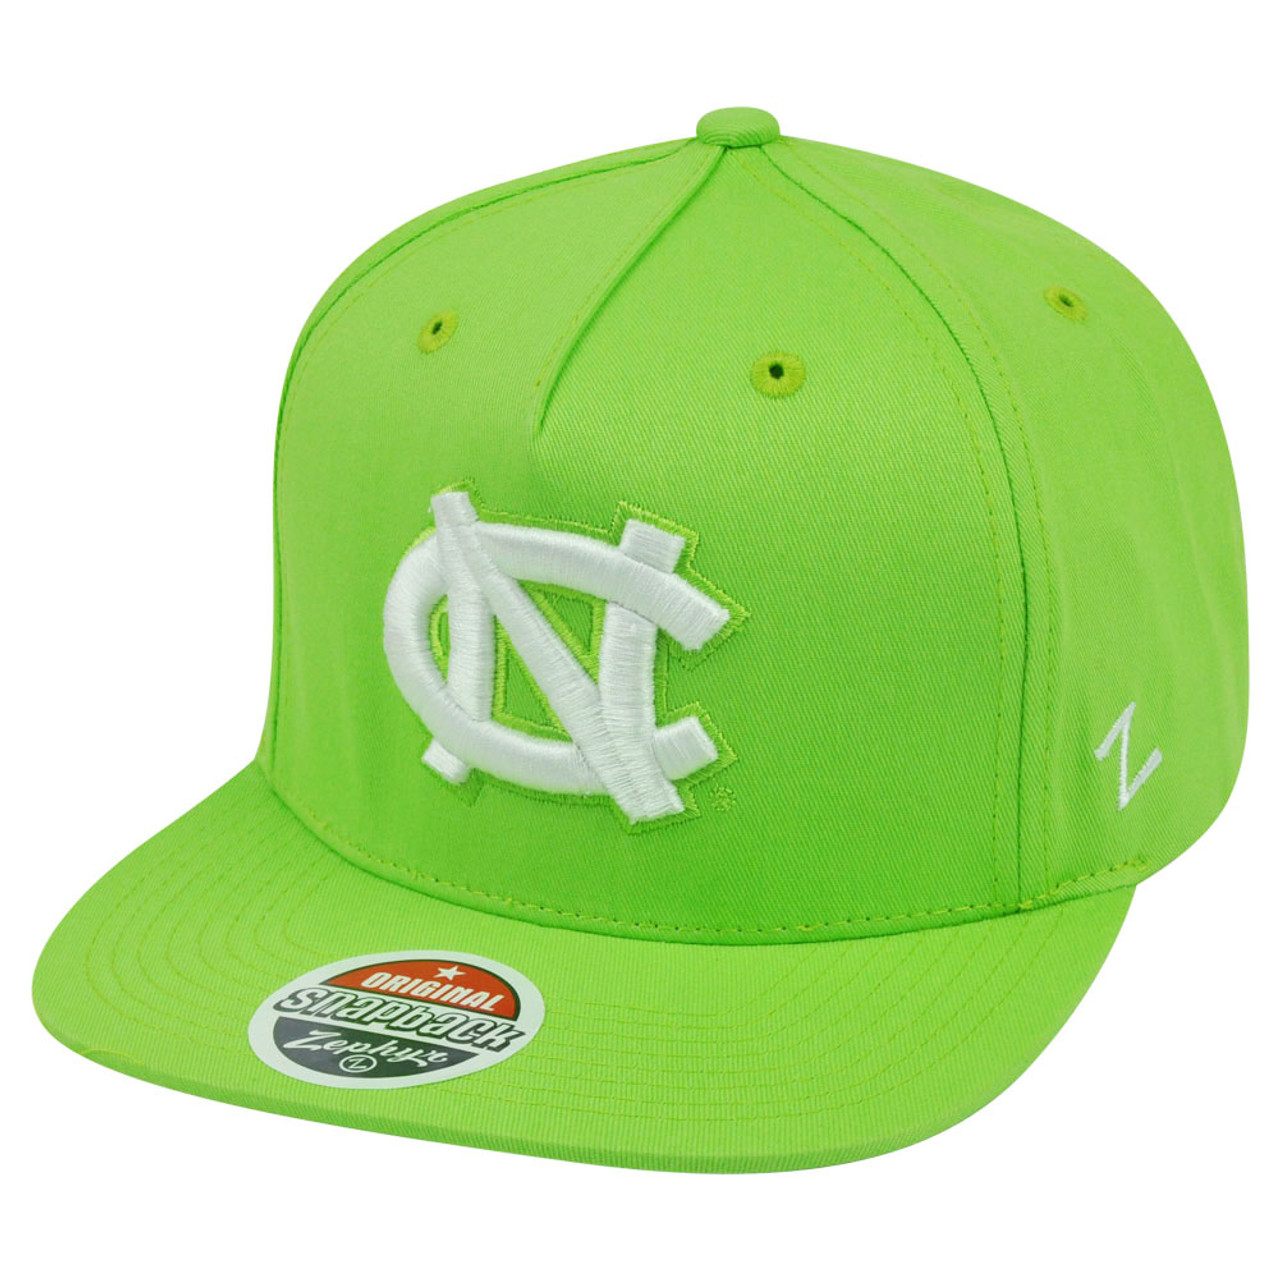 NCAA North Carolina Tar Heels Neon Green Snapback Flat Bill Zephyr Popsicle  Hat - Cap Store Online.com b1c5e67c98